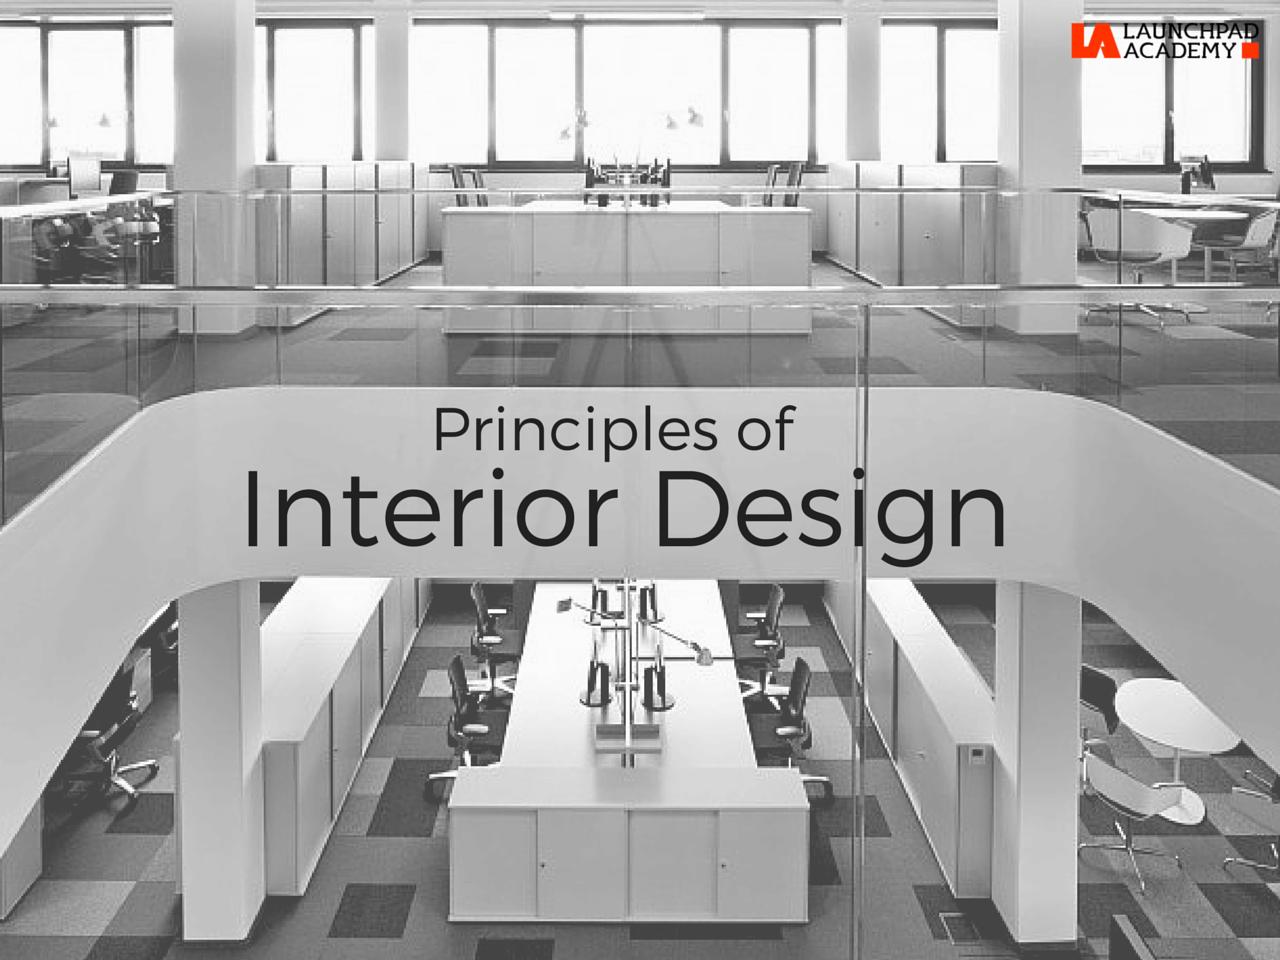 Interior Design Has 7 Principles Namely Unity Balance Rhythm Emphasis Contrast Scale